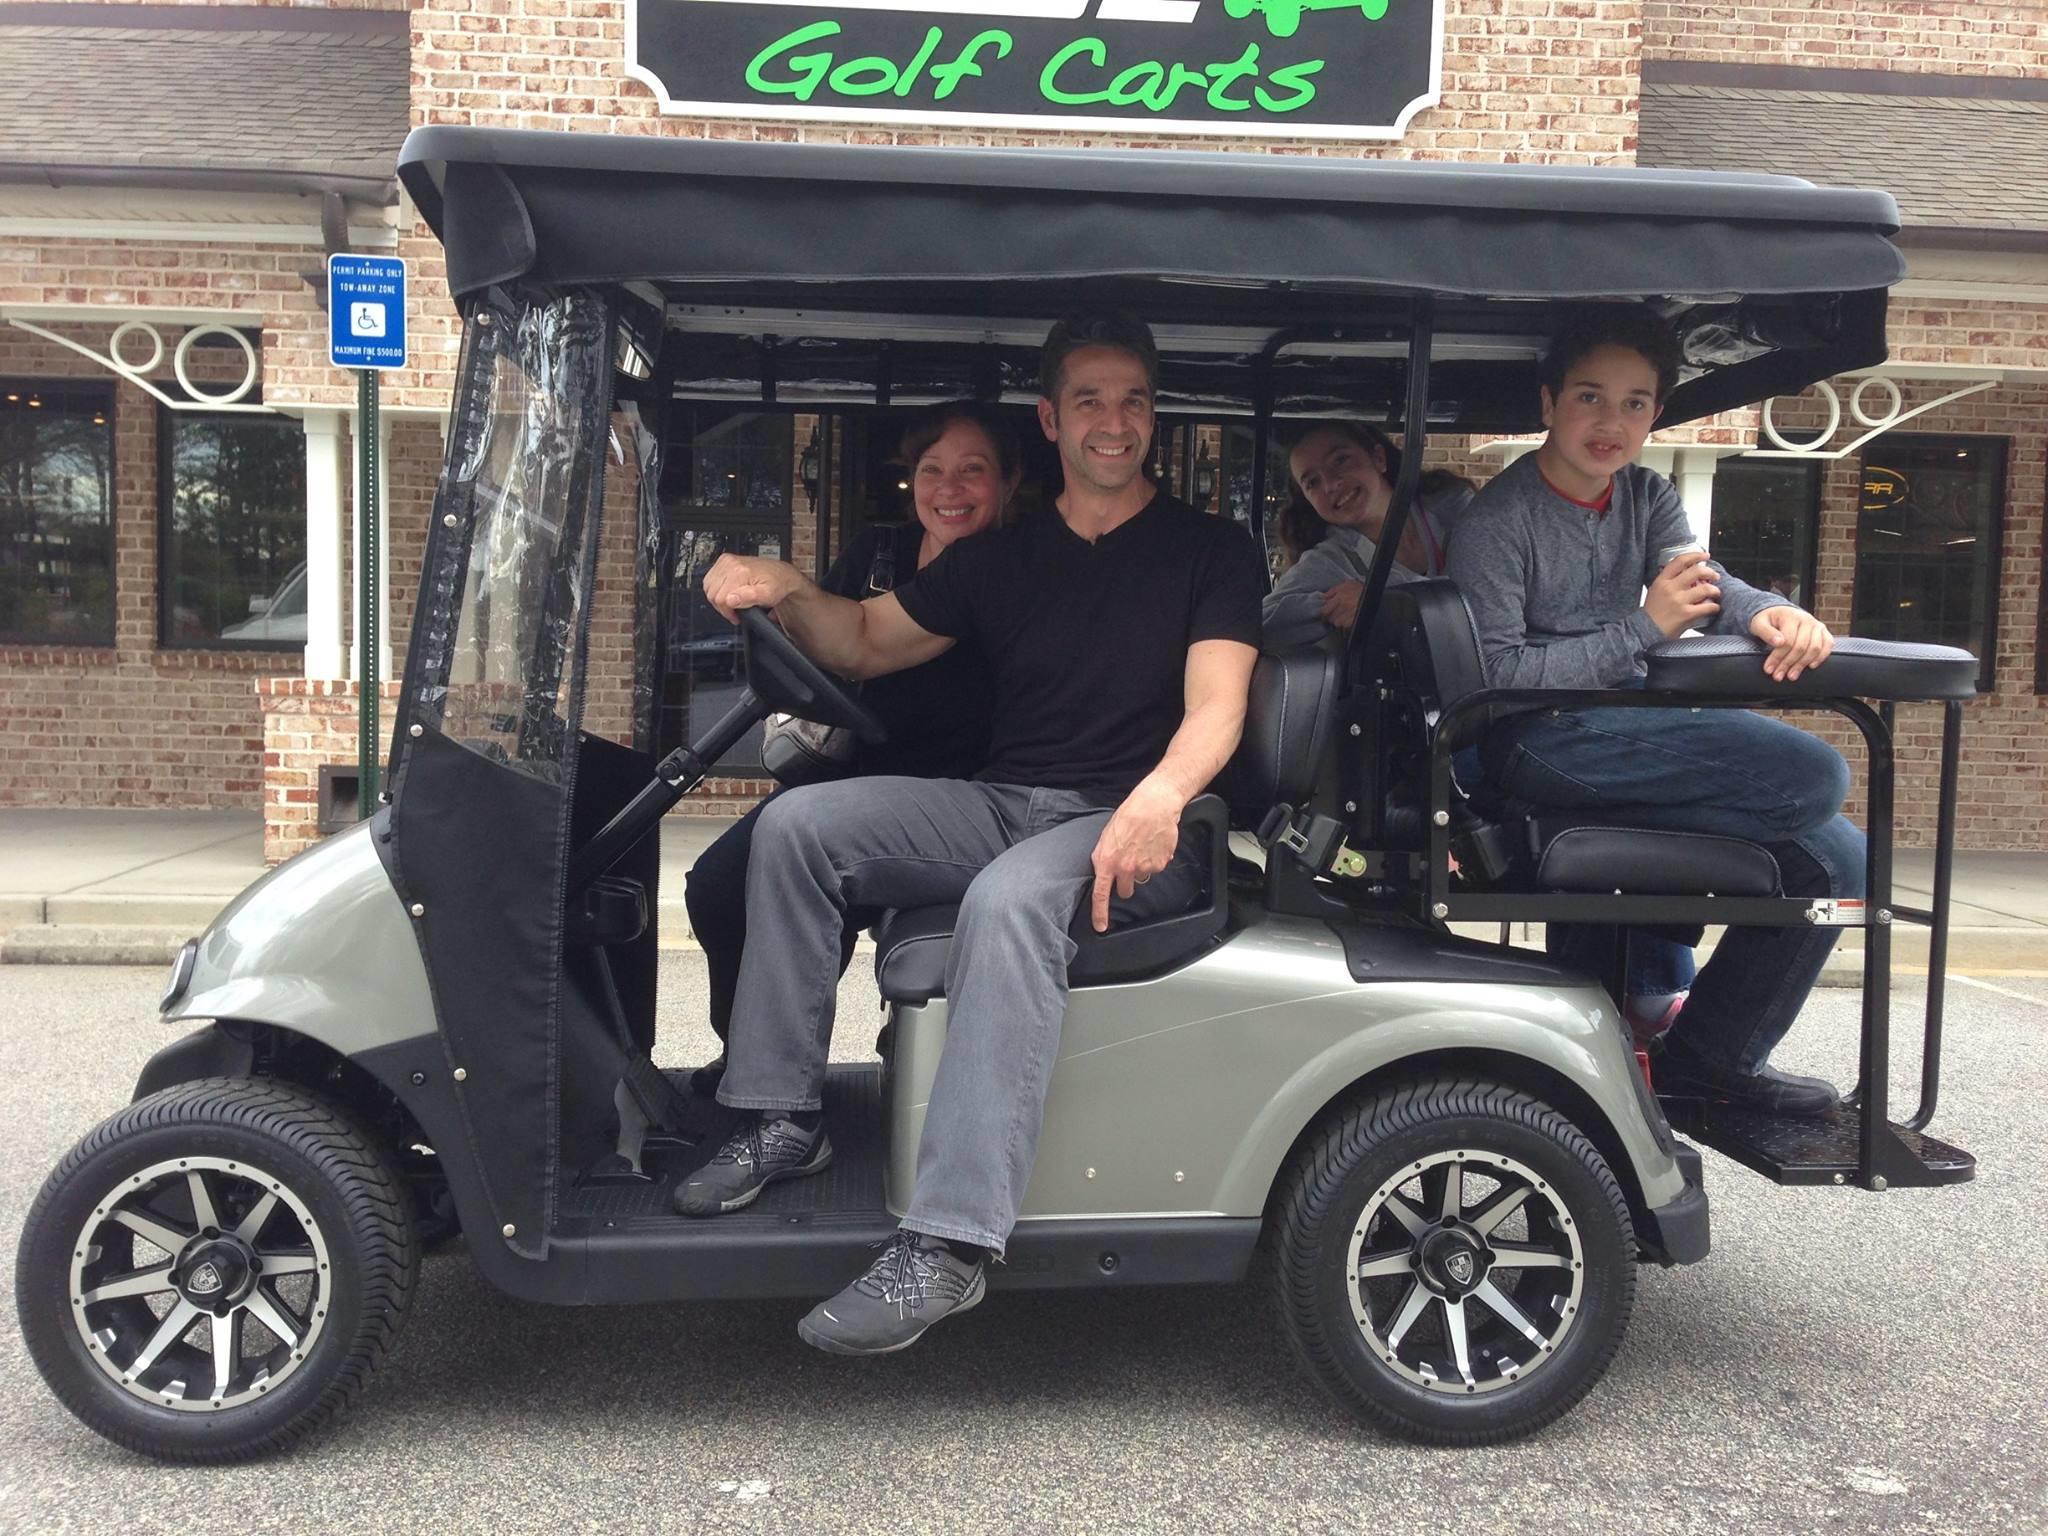 Peachtree City Golf Cars Inc